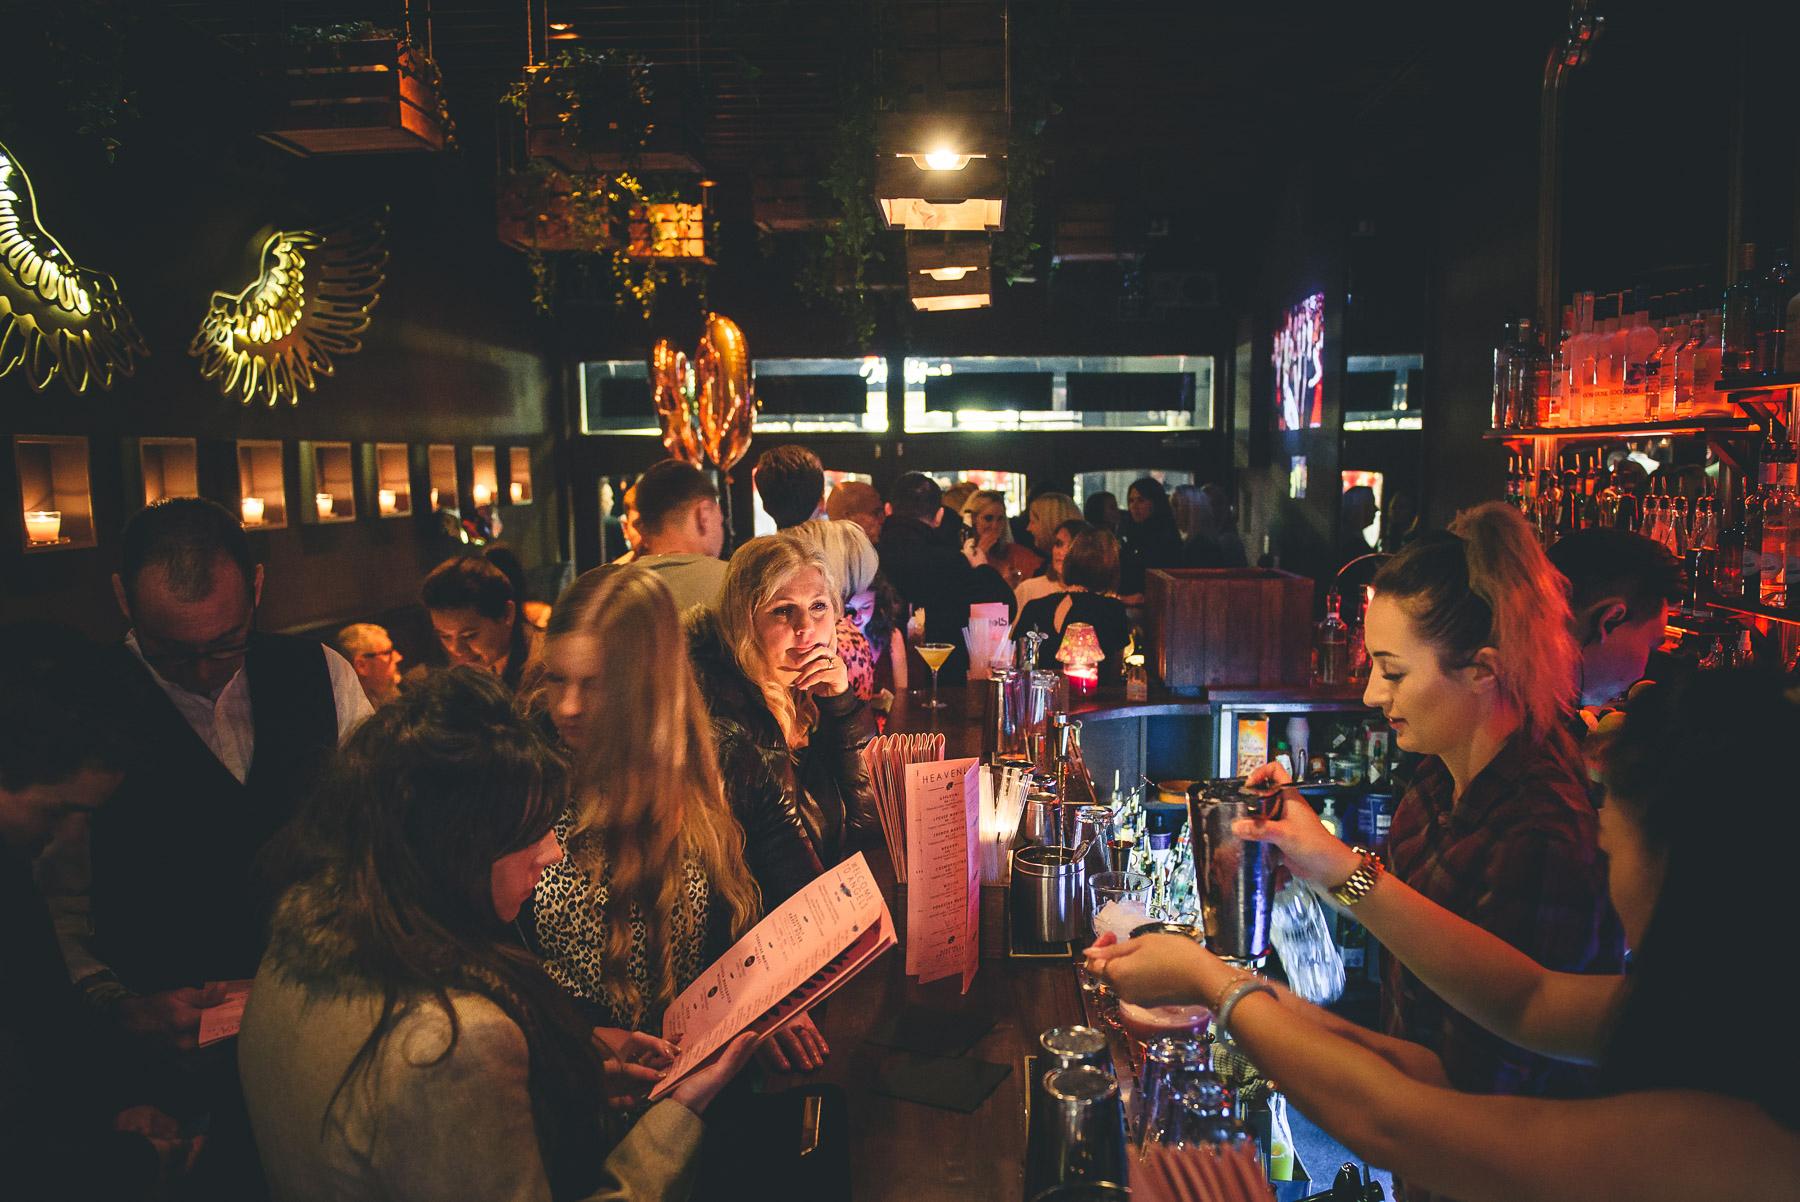 Angels cocktail bar Oxford_24.11.2018_816.jpg